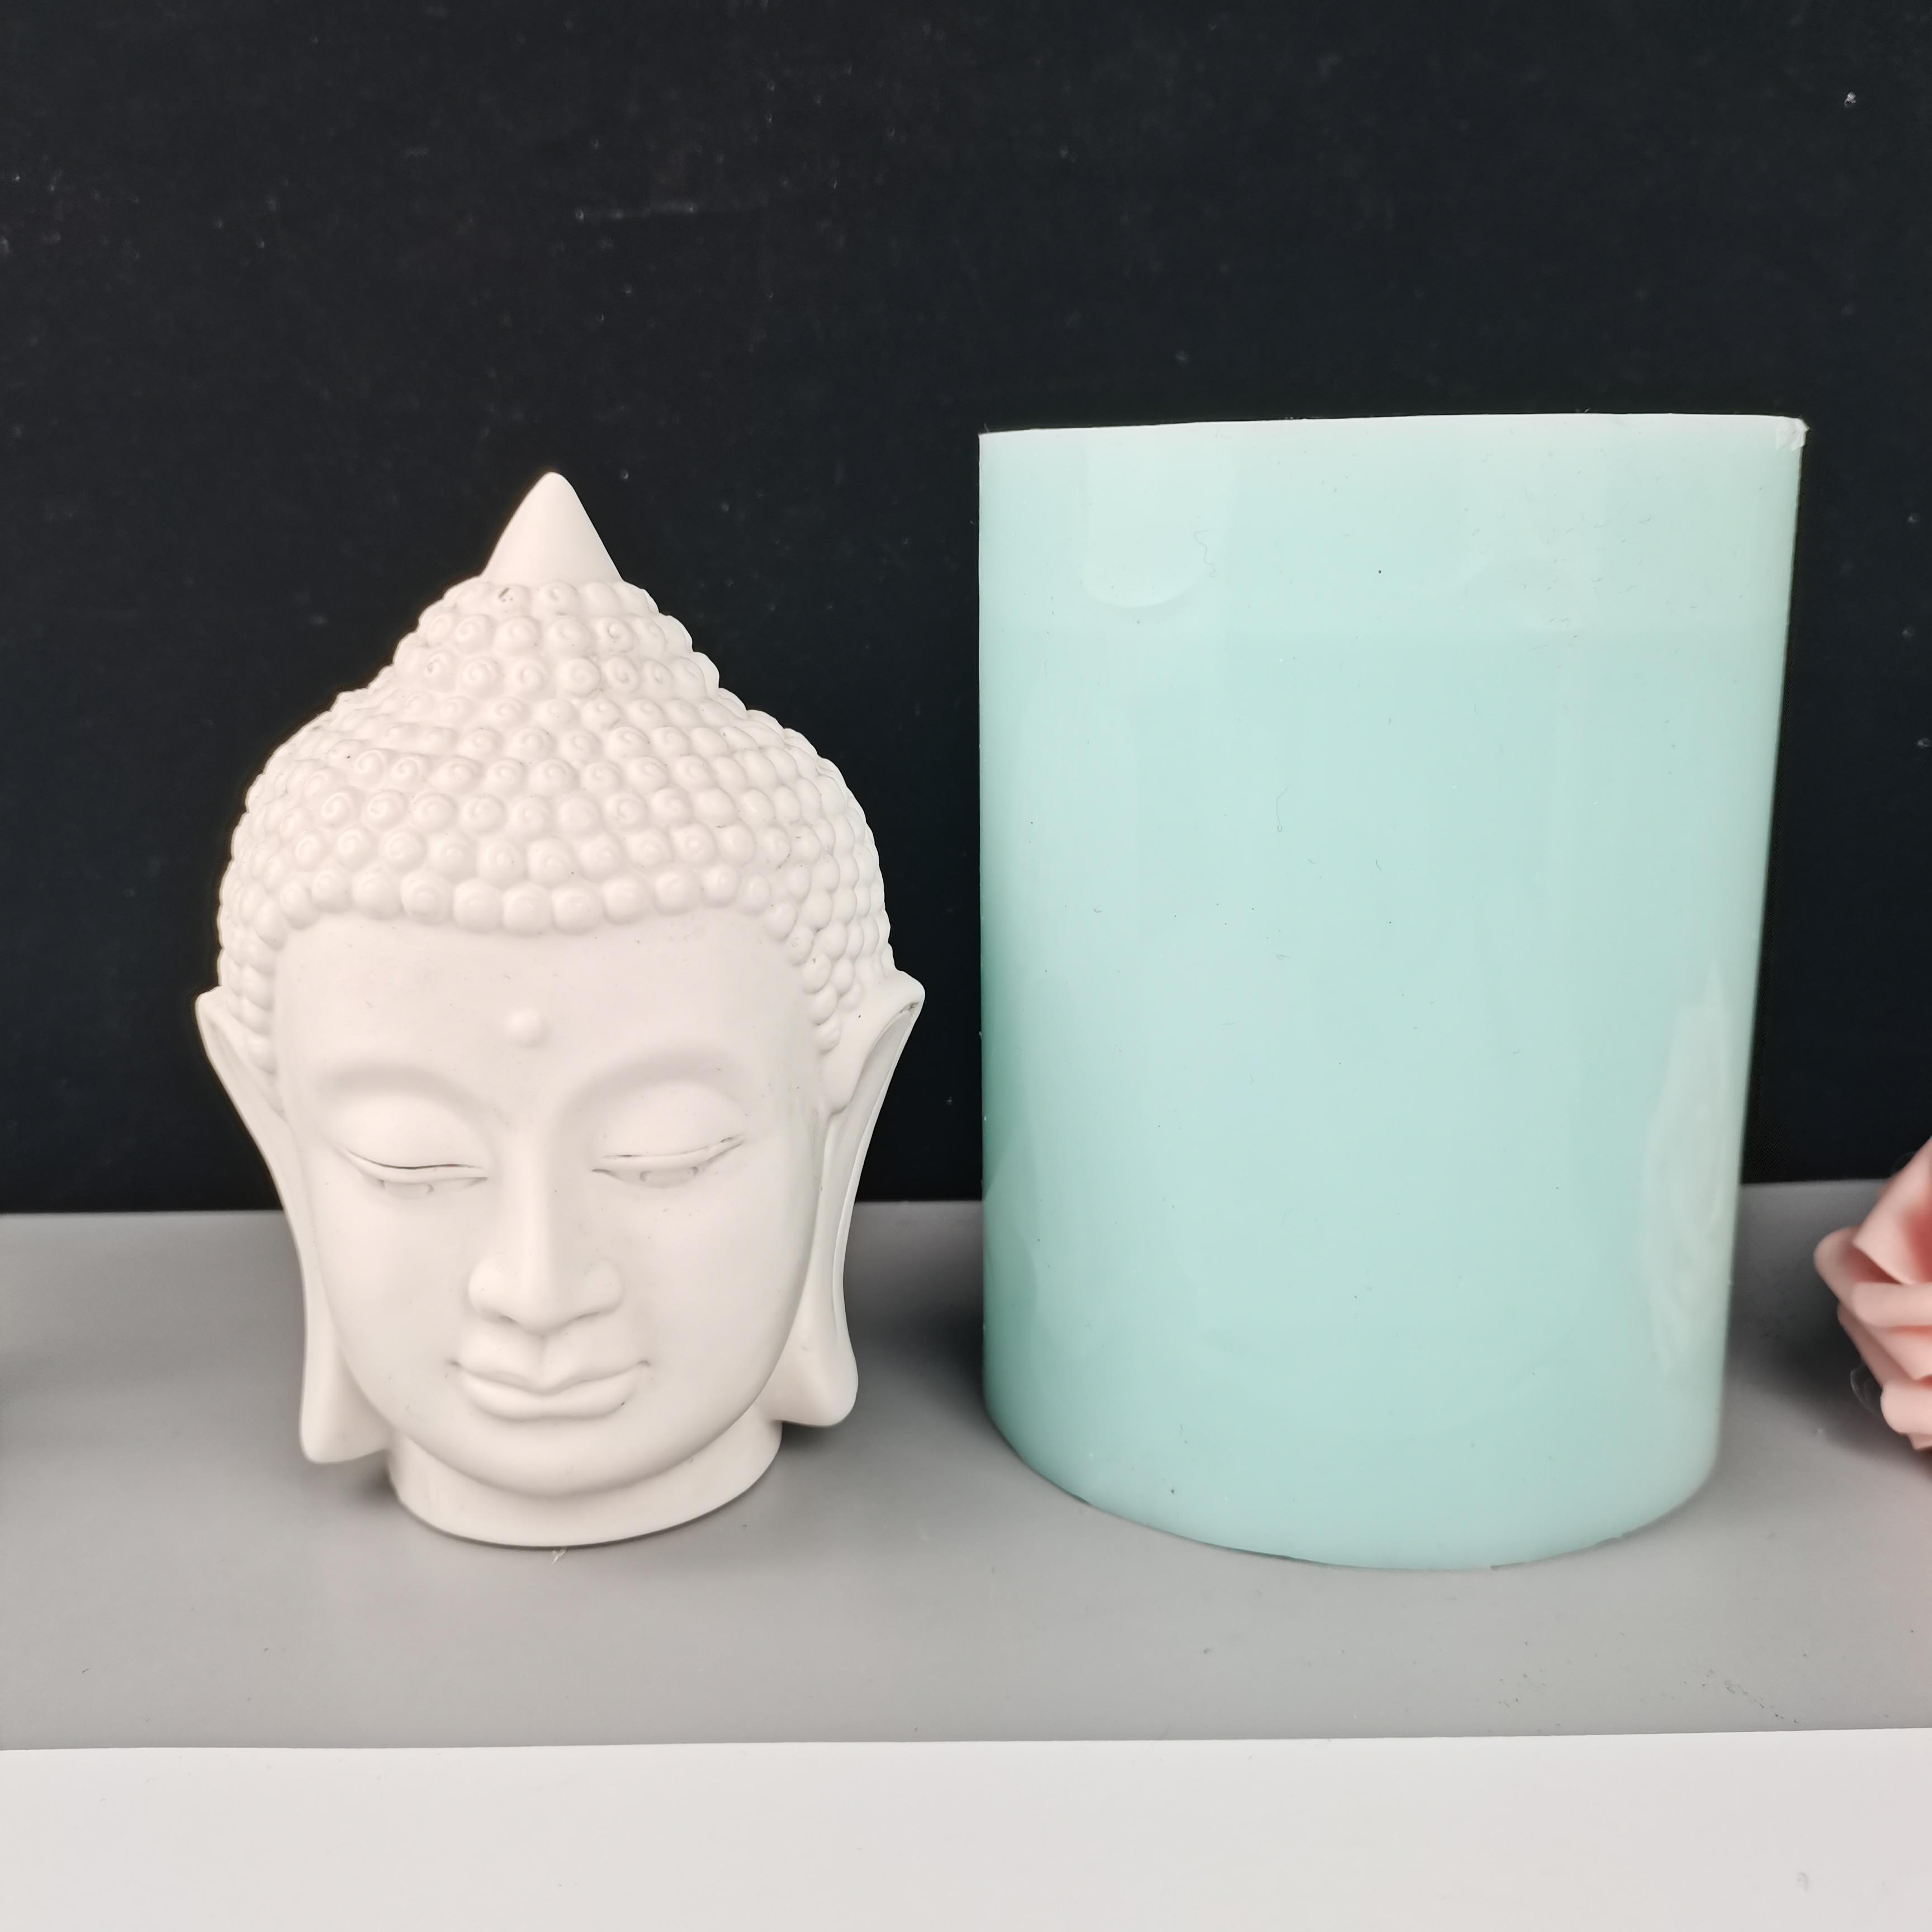 PRZY 2020 New Buddha Head Silicone Mold Statue Clay Plastic Plaster Mold Home Candle Decoration Soap Buddha Head Mold